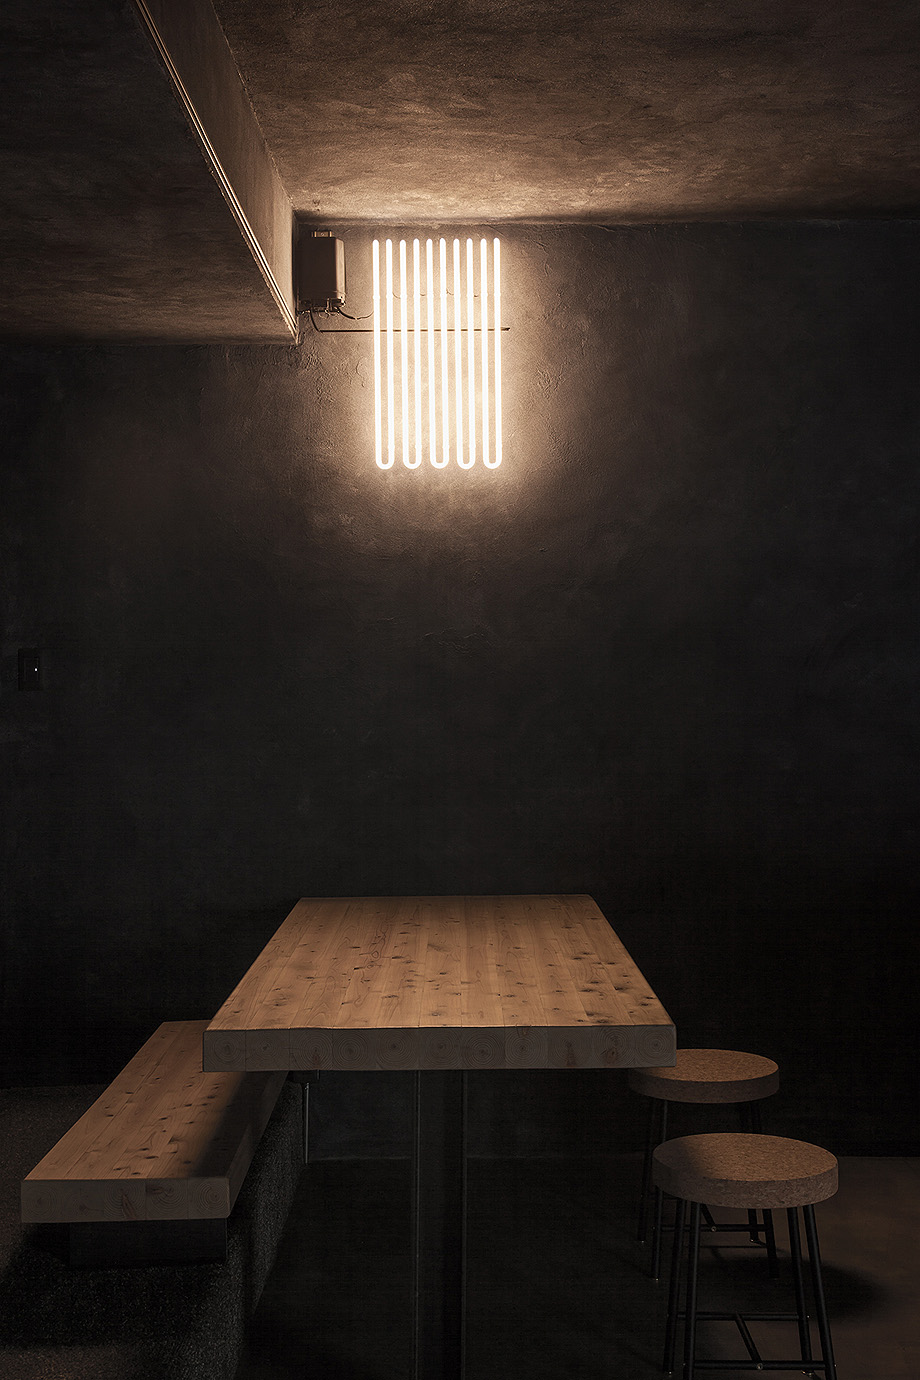 apartamento 202 en shibuya de hiroyuki owaga - foto kaku ohtaki (12)